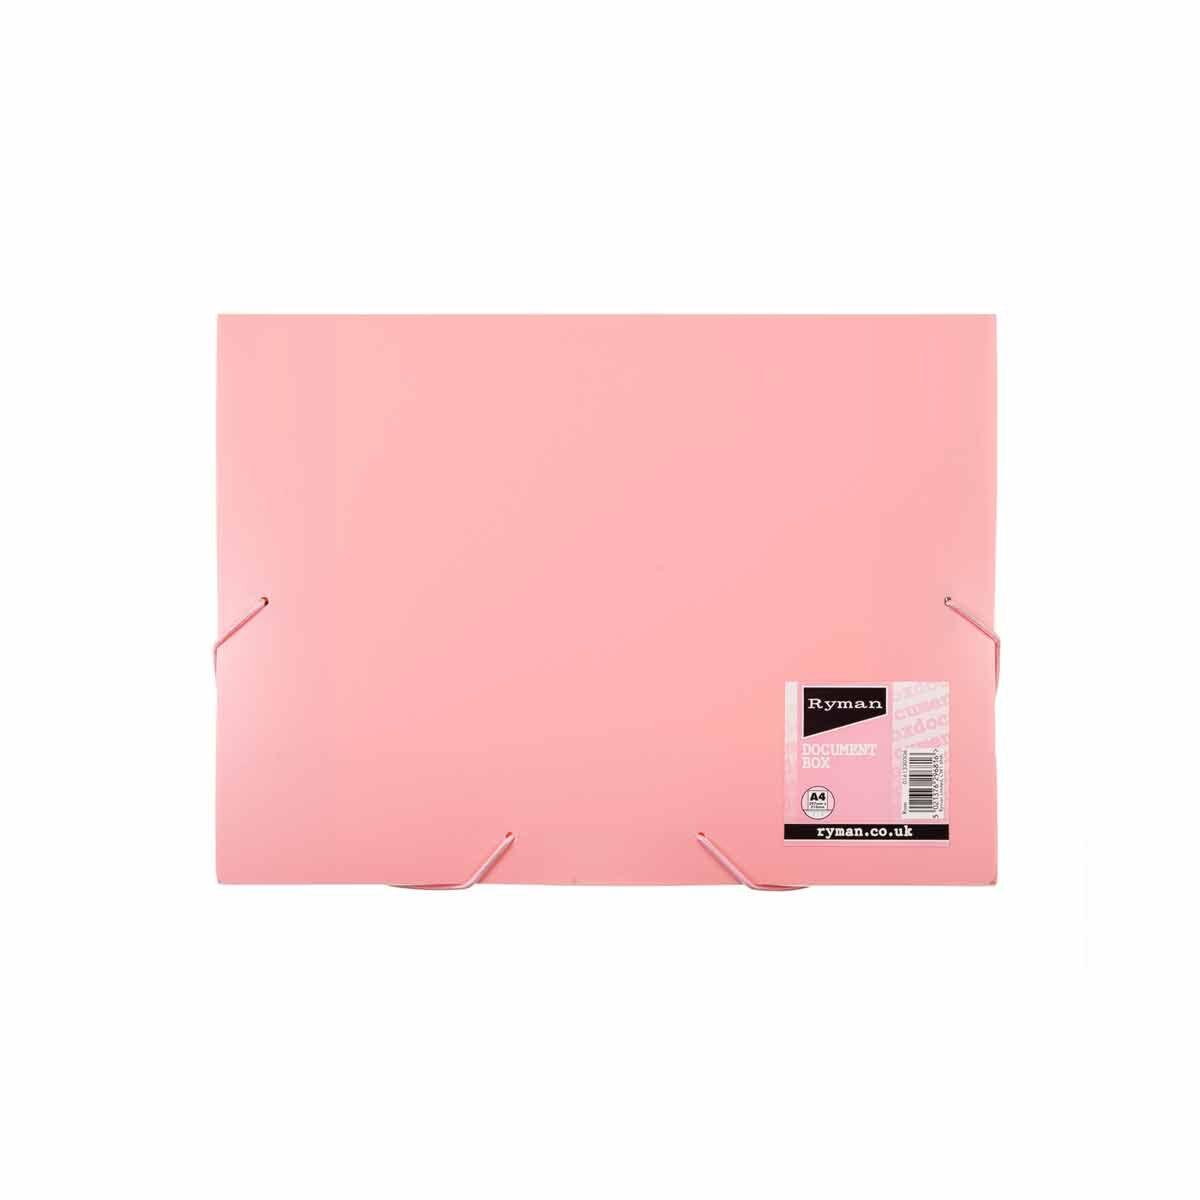 Ryman Pastel Document Box A4 Rose